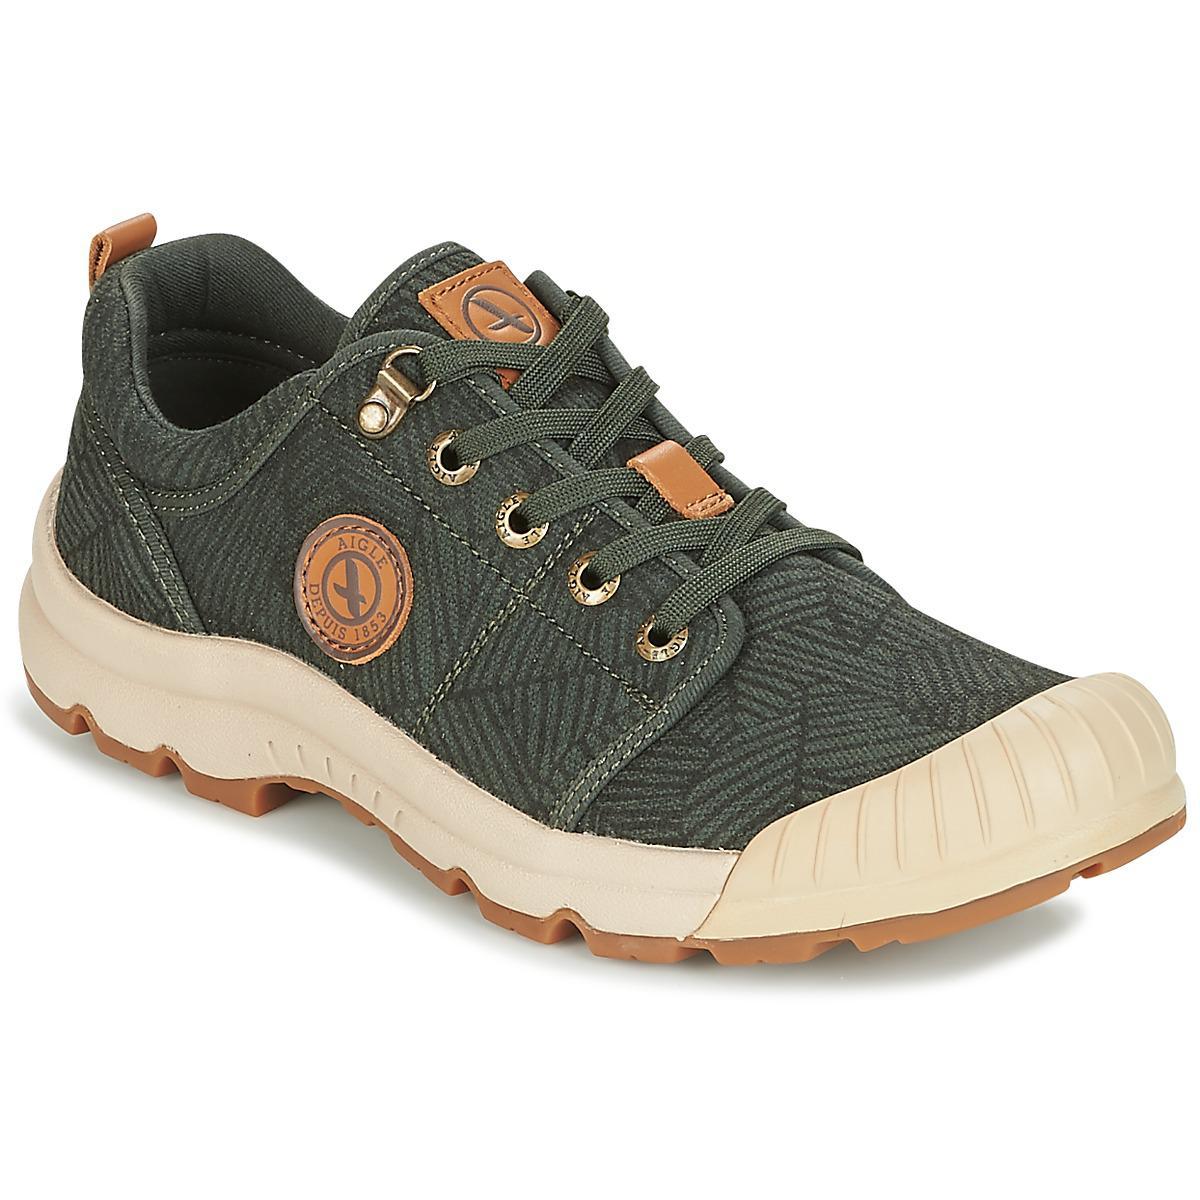 Shoes In Low Tenere Print Aigle Light Men's trainers Green Canvas gFWq4R